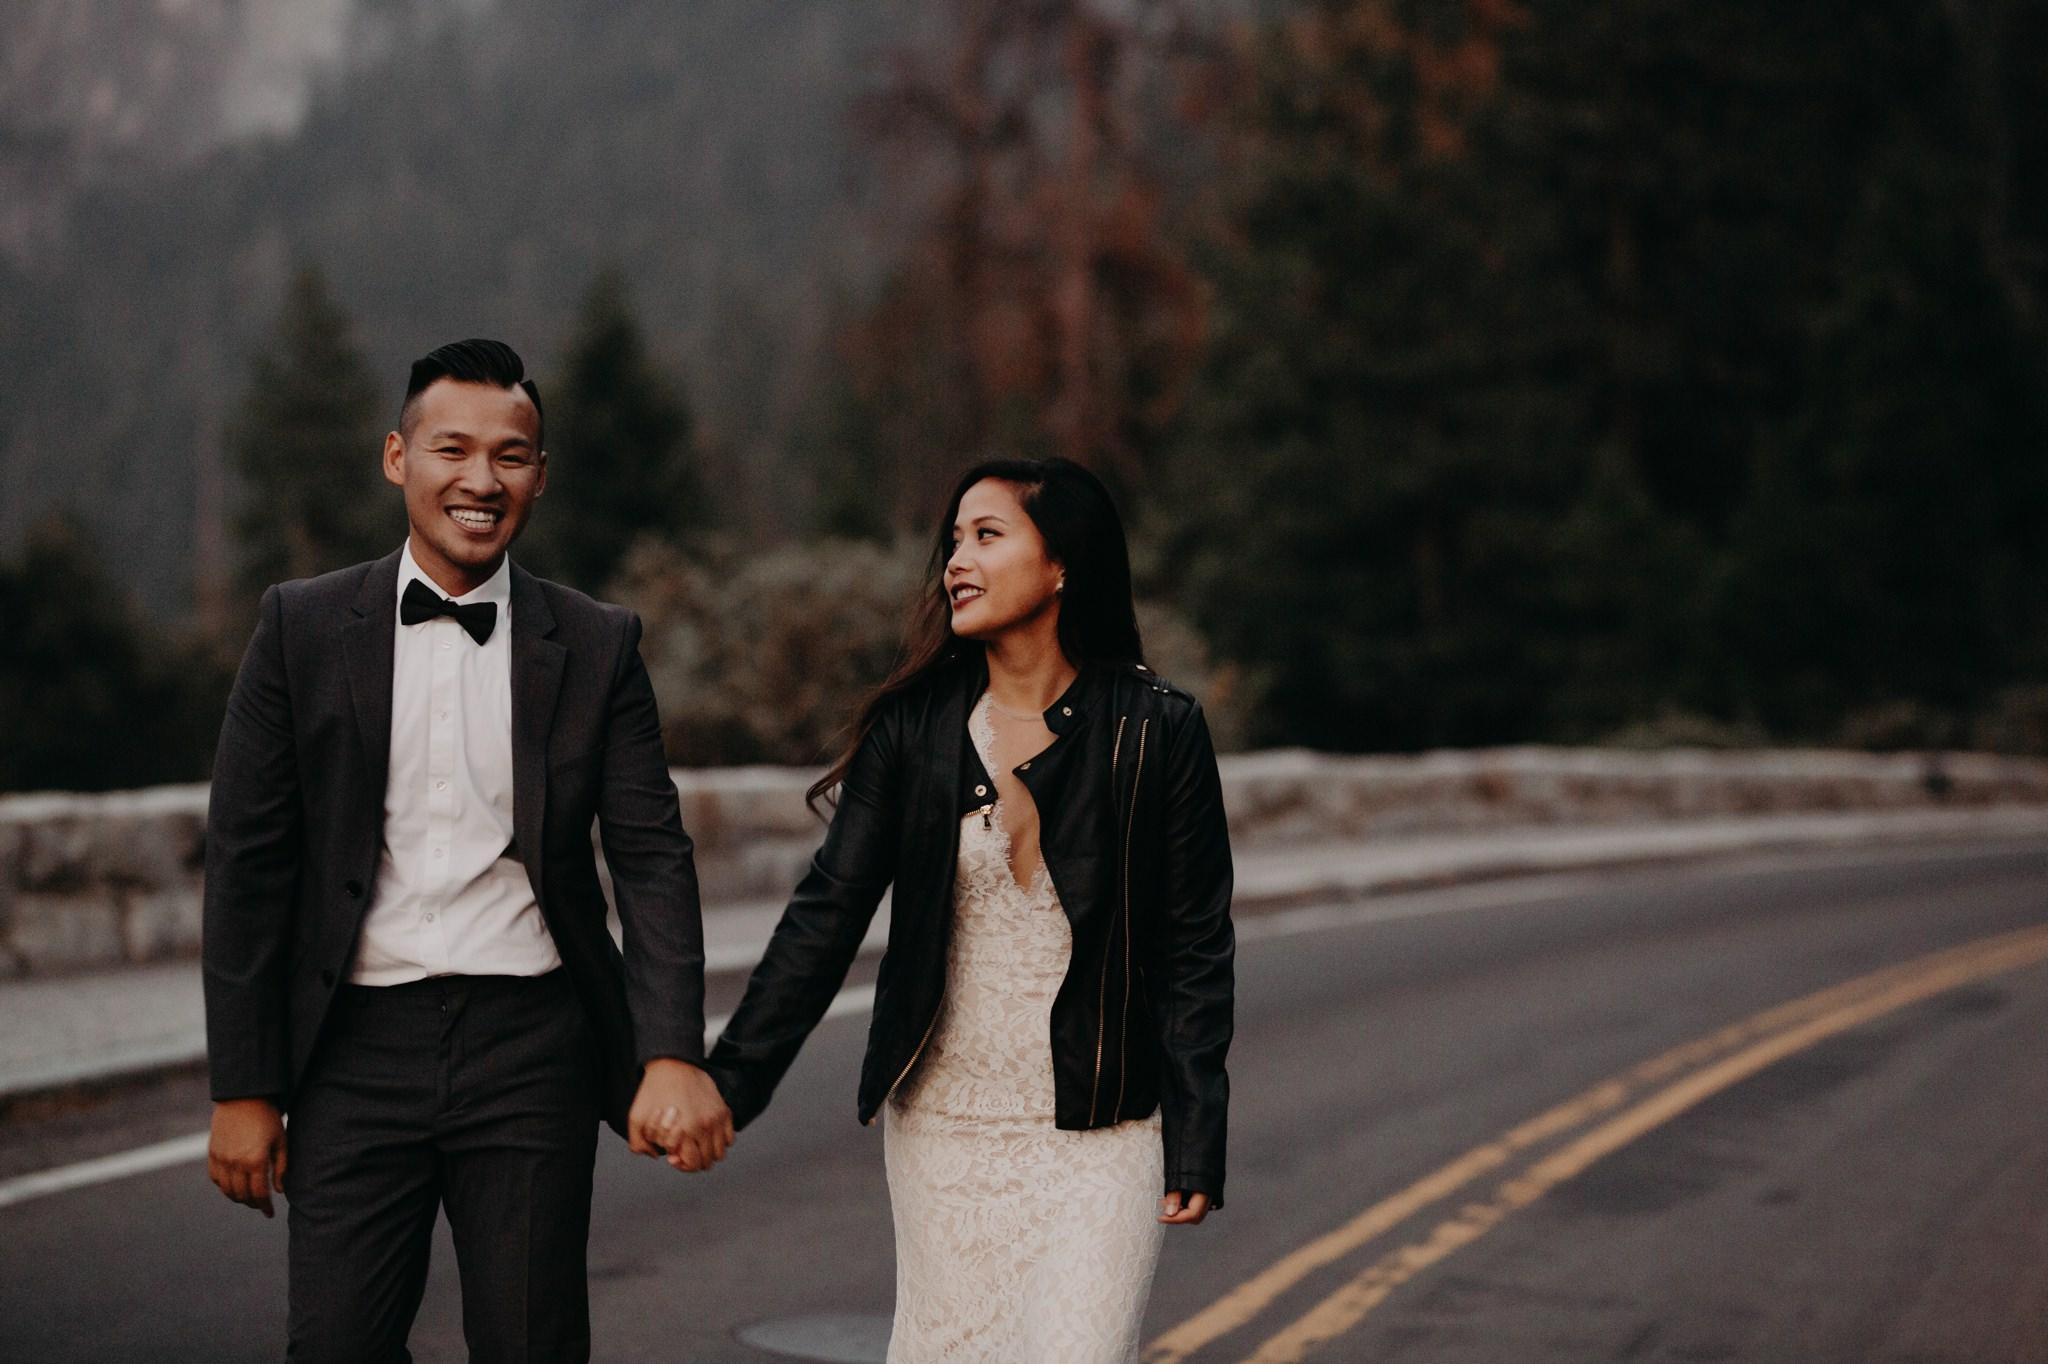 Yosemite-Wedding-Photographer3.jpg